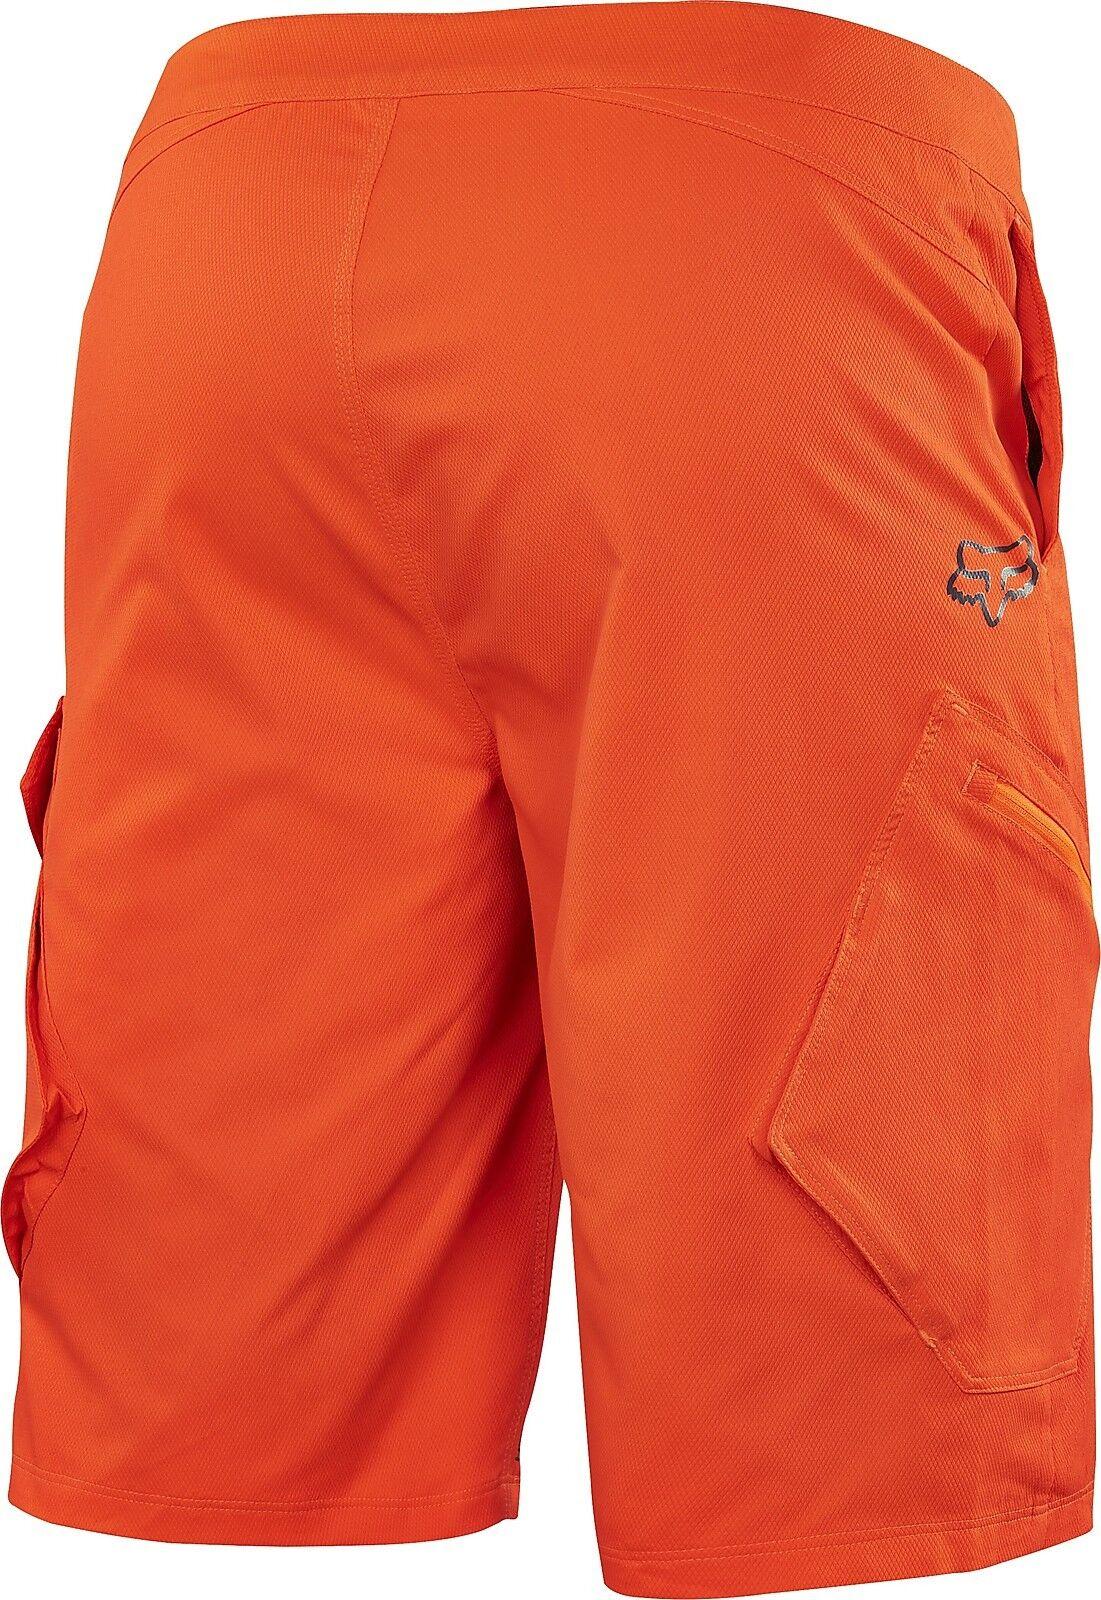 Fox Racing'15 Ranger Cargo 12  corto Flo Naranja Naranja Naranja 120702